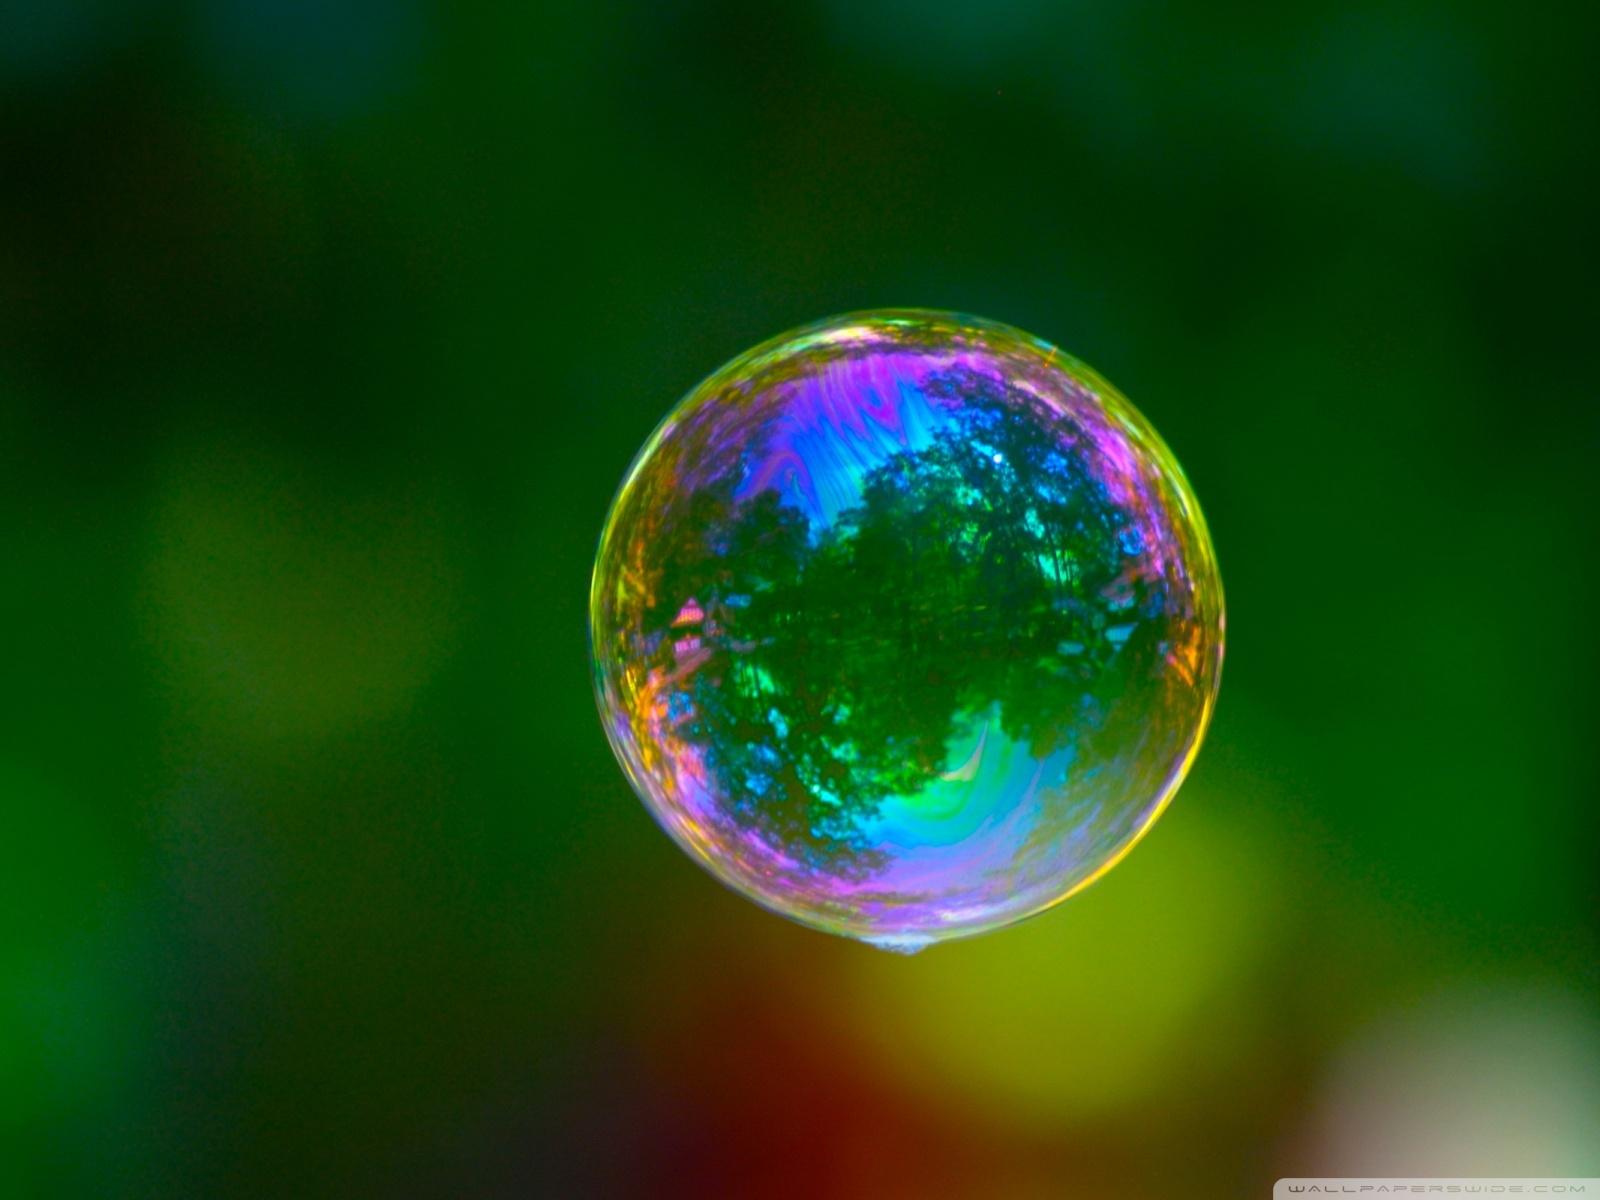 Ipad Wallpaper Hd Download Colorful Bubble 4k Hd Desktop Wallpaper For 4k Ultra Hd Tv